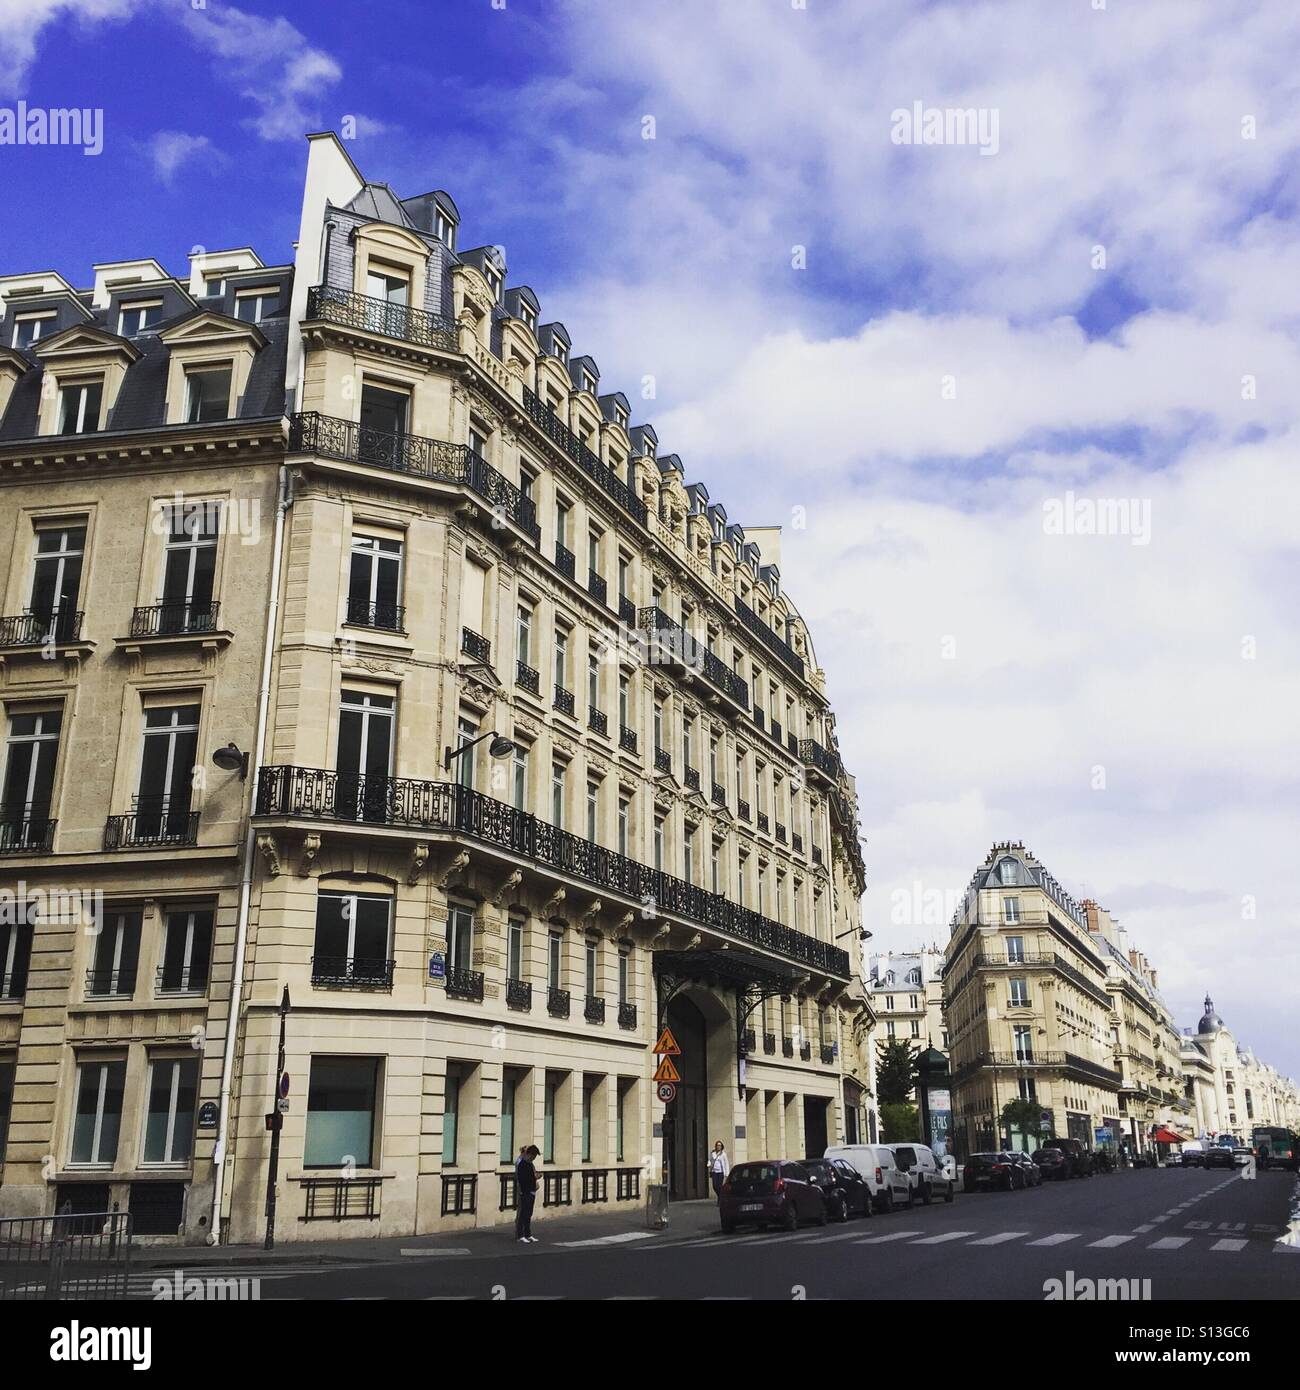 Street scene Paris France - Stock Image